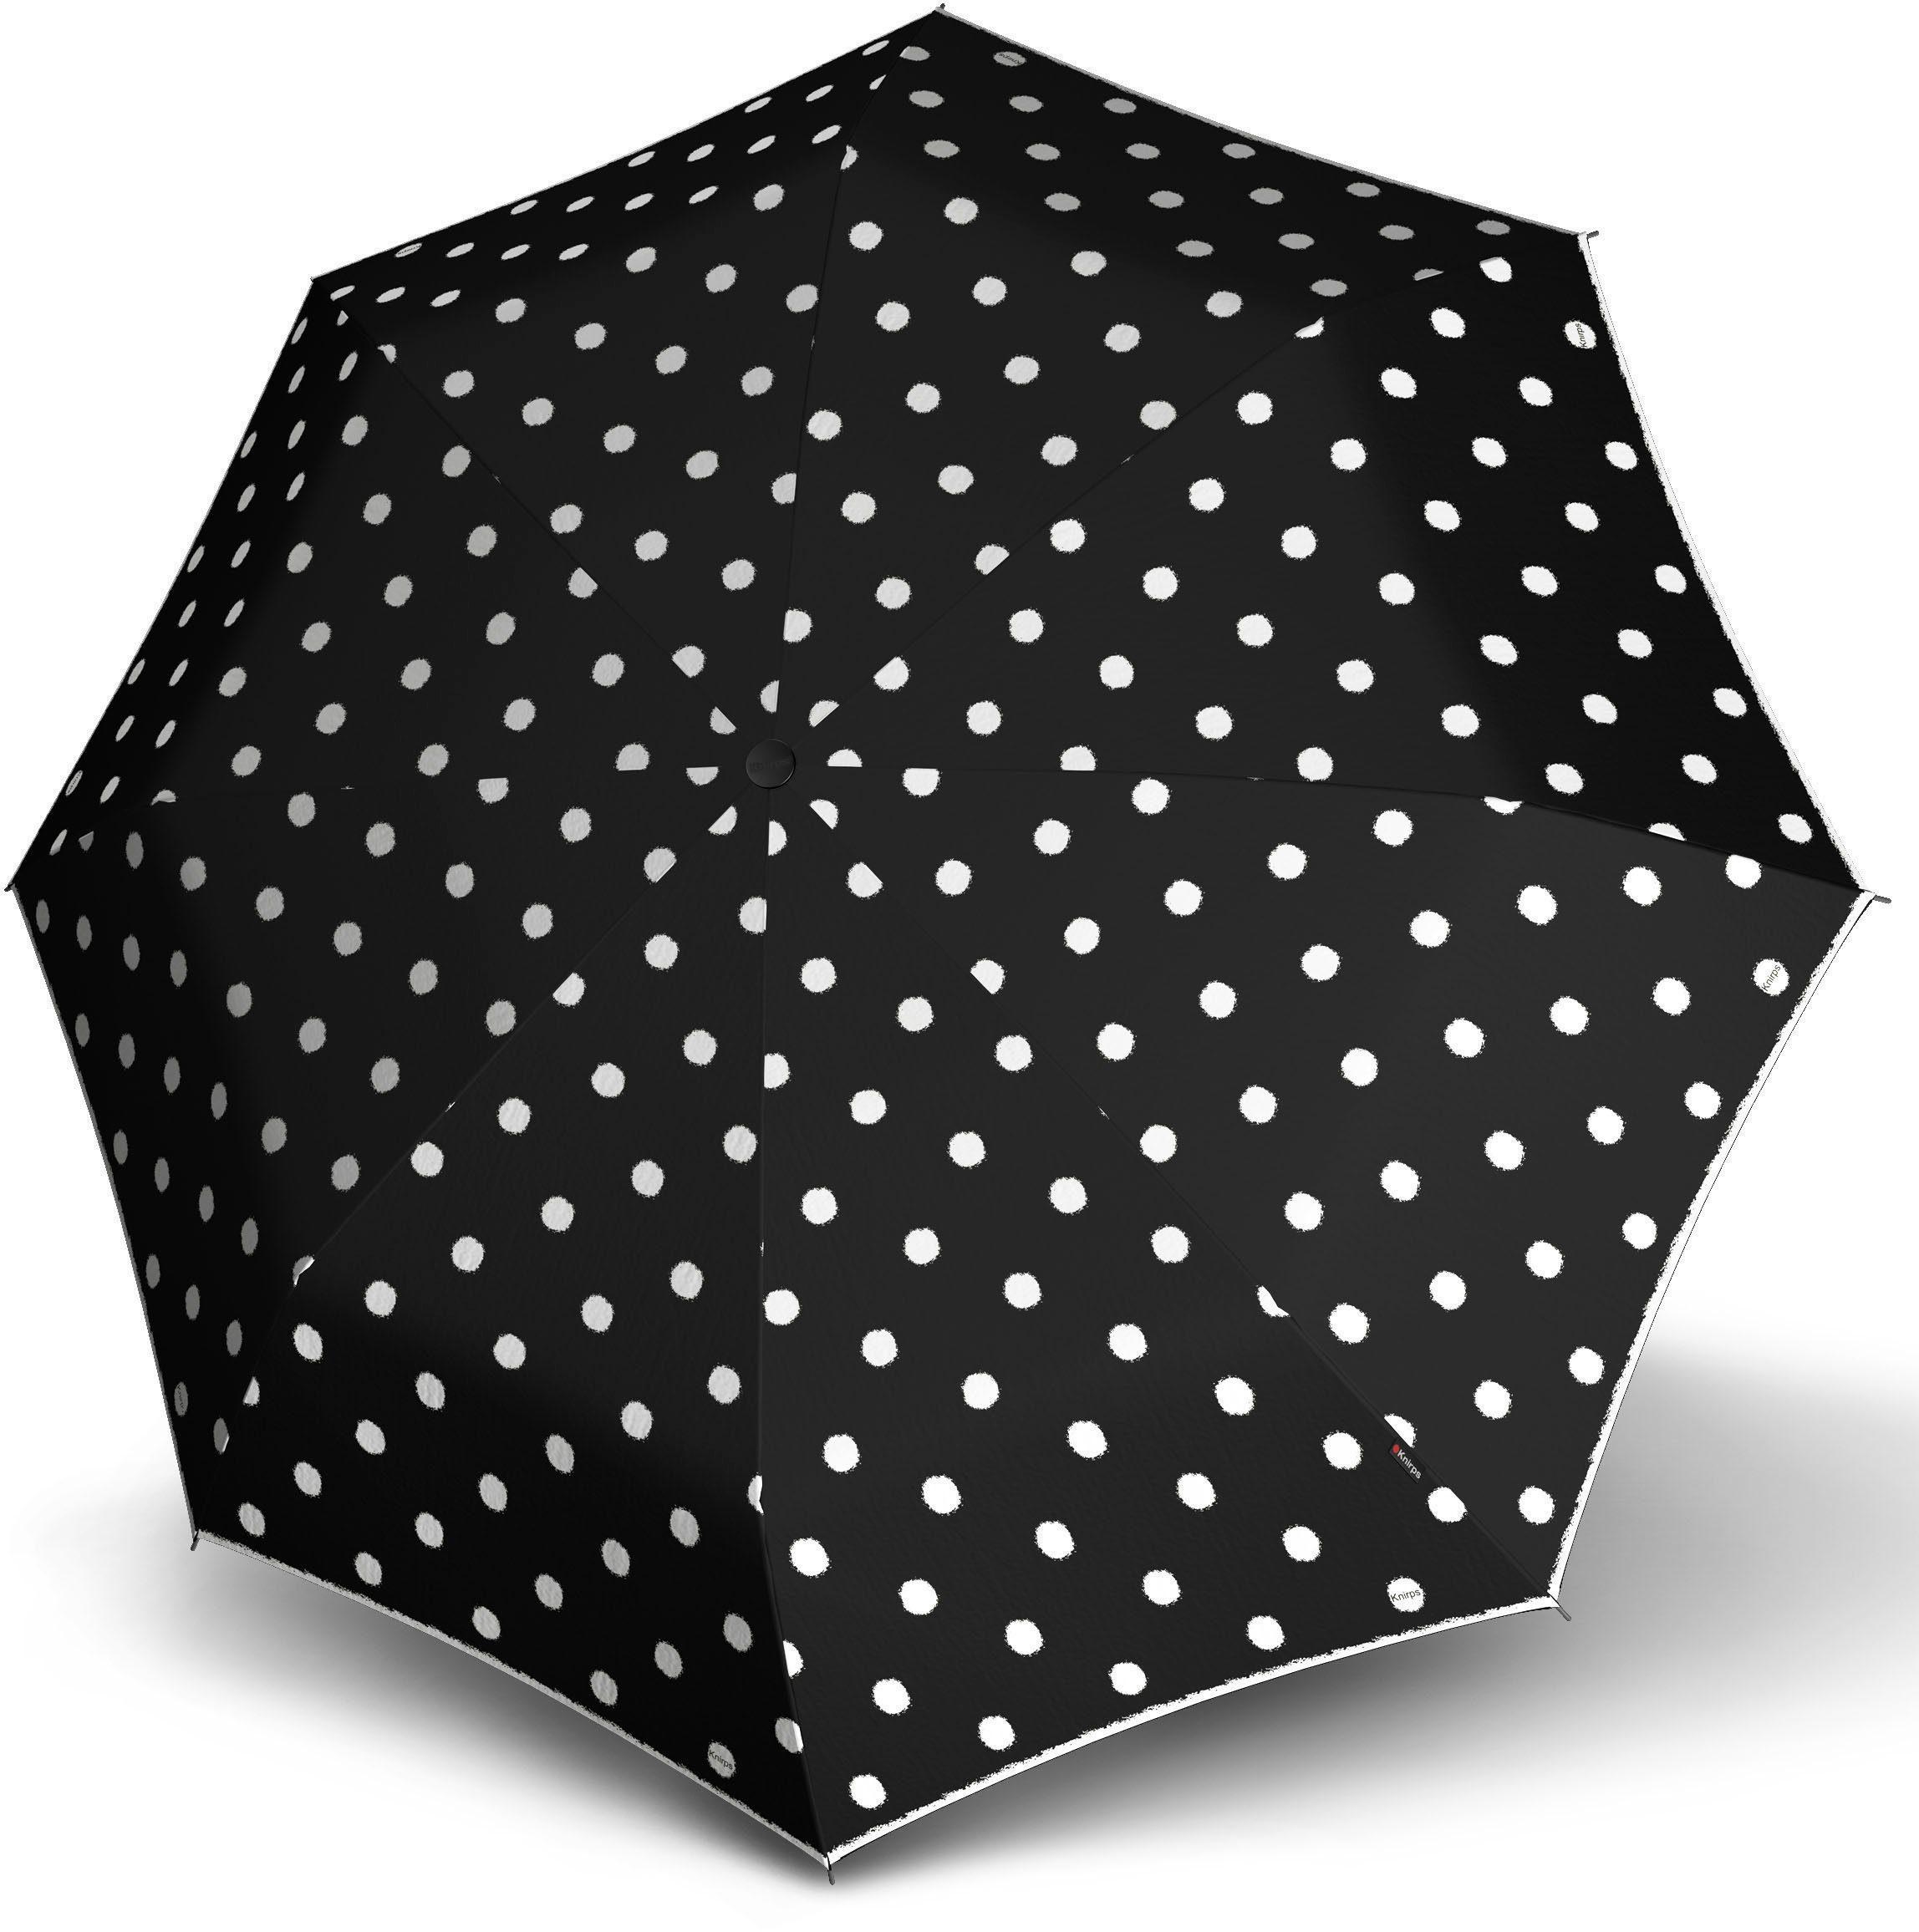 Knirps® Regenschirm, »Taschenschirm T2 dot art black«